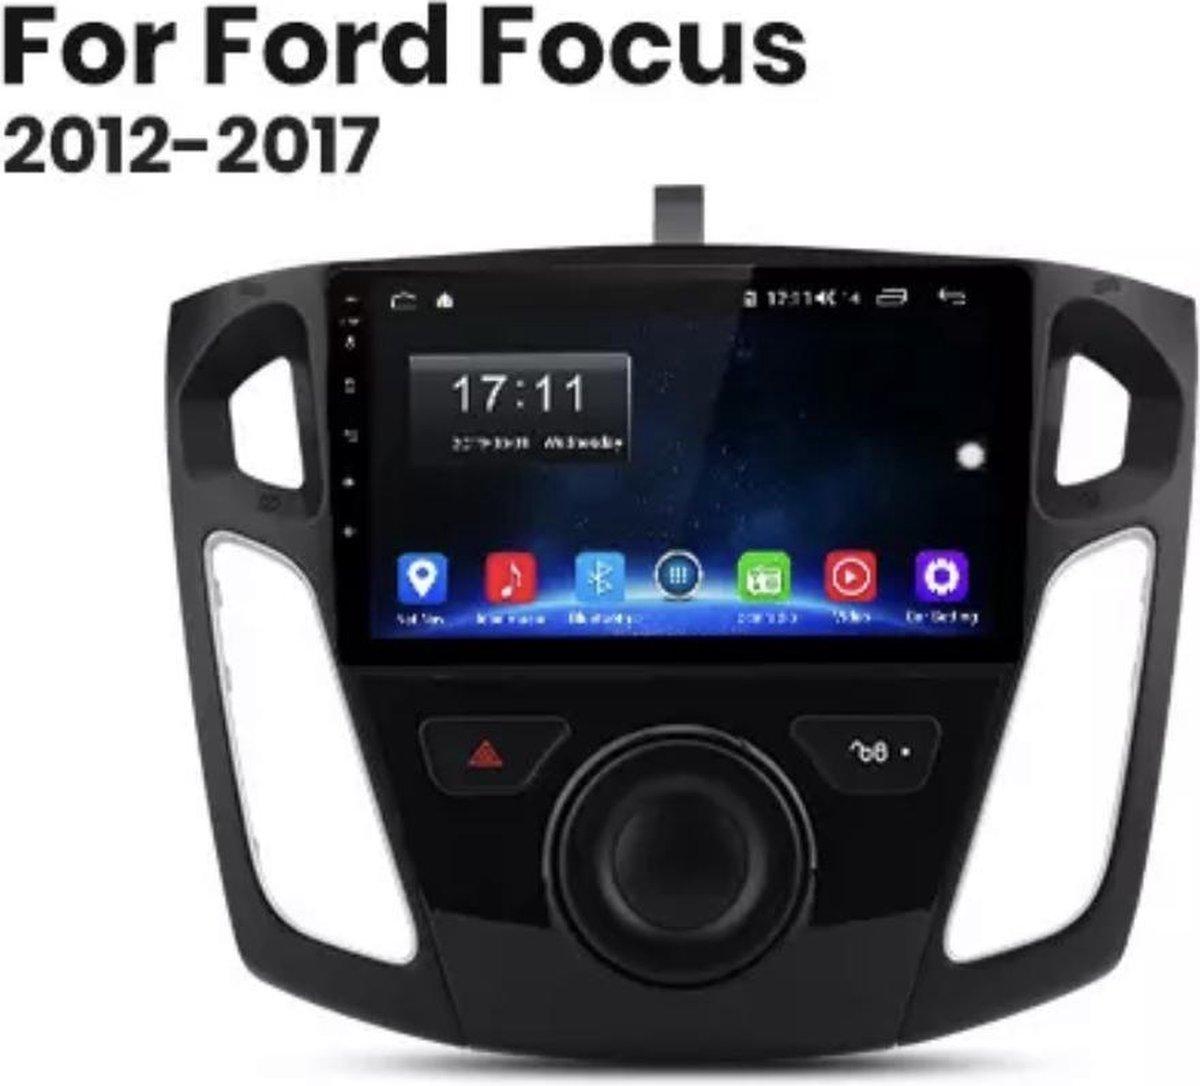 gratis camera!! Ford Focus 2012-2017 Android 10 1+16GB navigatie en multimediasysteem